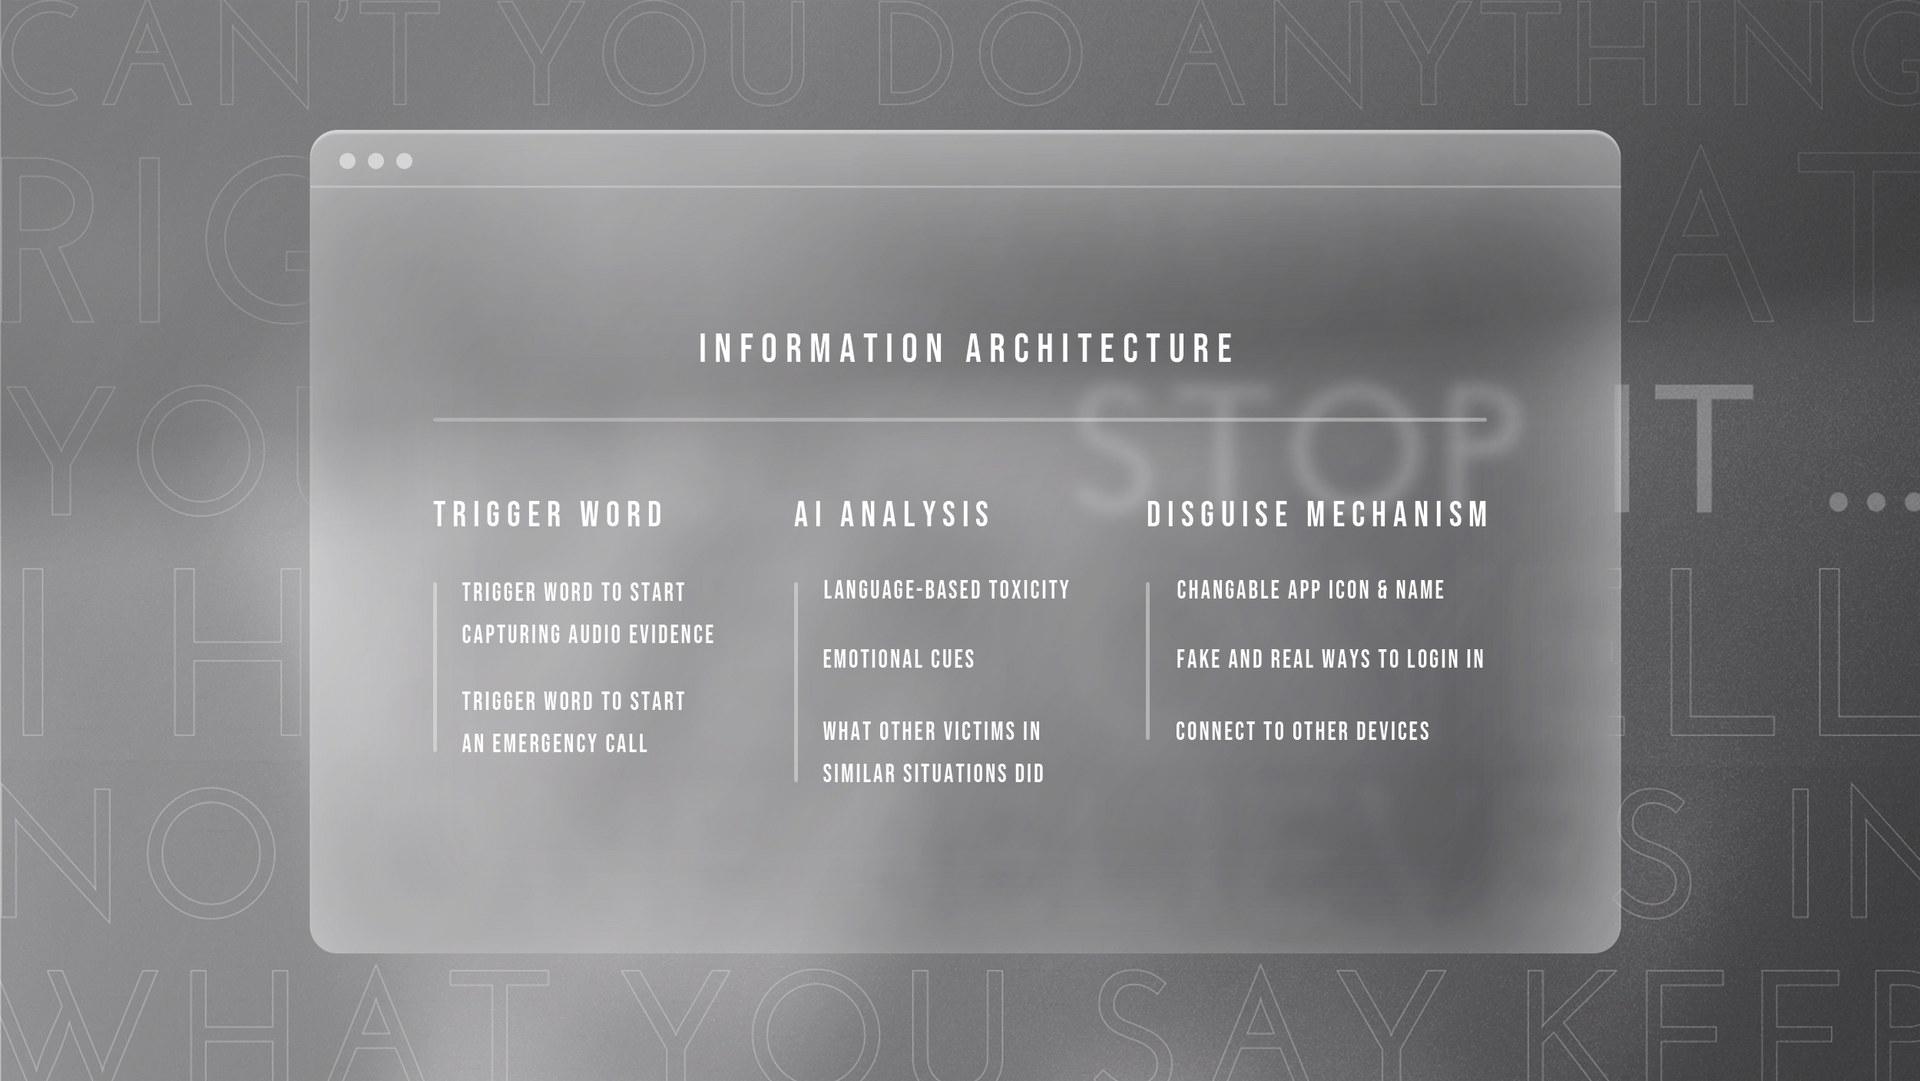 Information architecture of Cepi